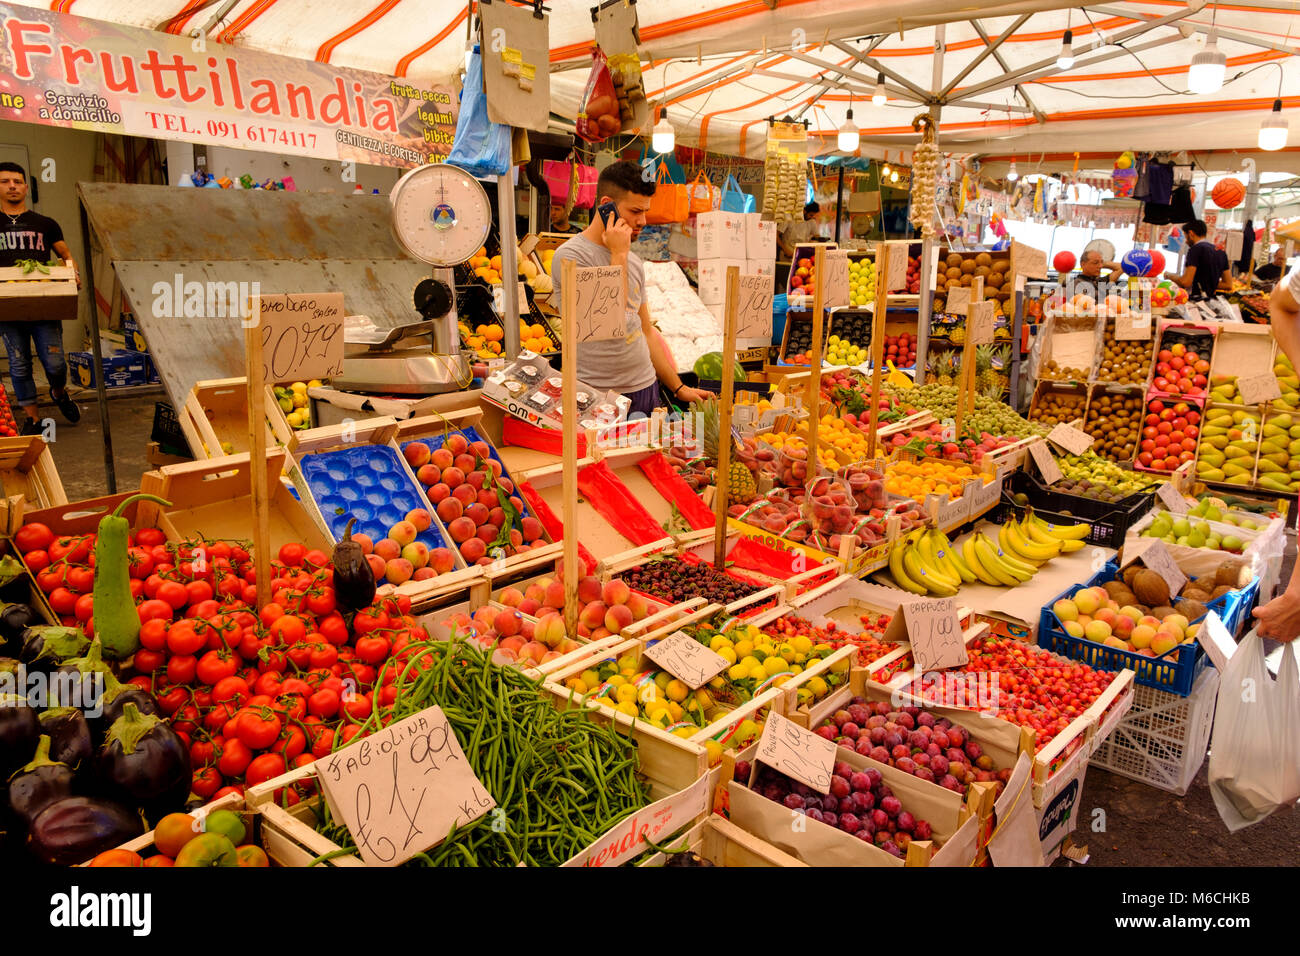 Fruit and Vegetable Market Ballaro Market, Mercato di Ballaro, Palermo, Sicily, Italy - Stock Image